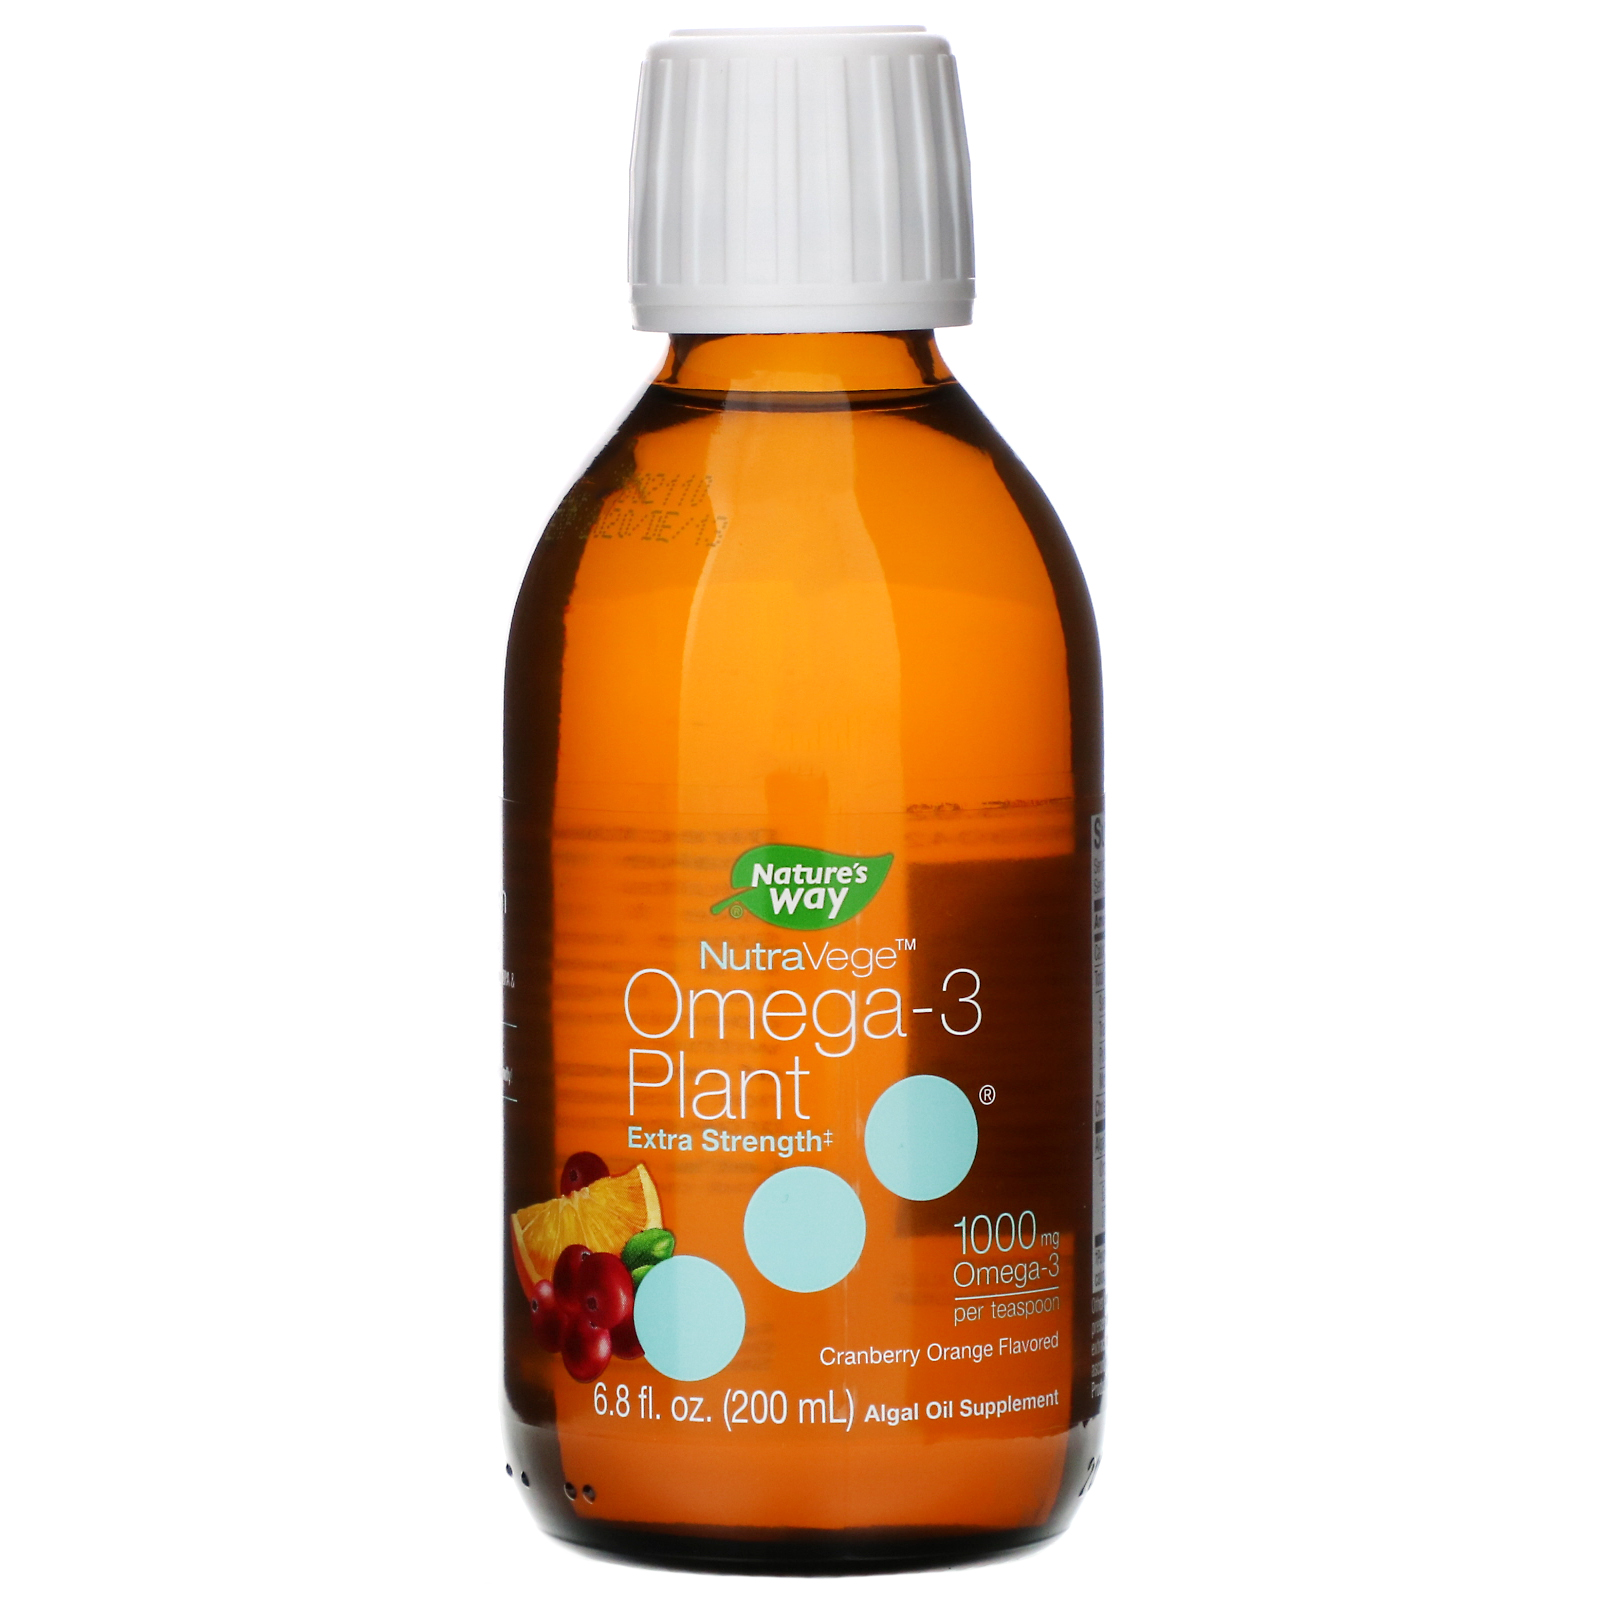 Ascenta, NutraVege, Omega-3 Plant, Extra Strength, Cranberry Orange Flavored, 1000 mg, 6.8 fl oz (200 ml)